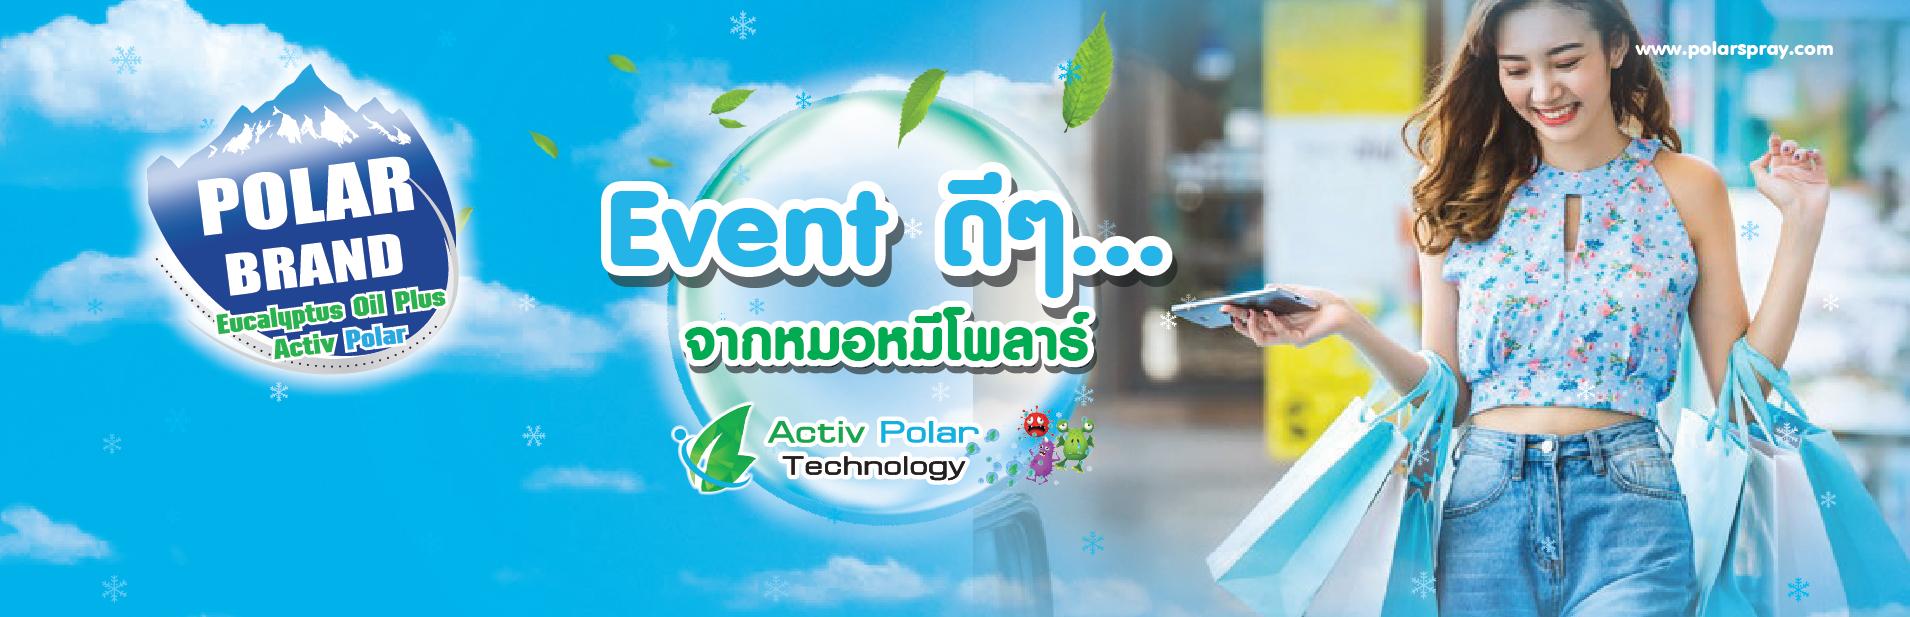 2AW_Banner_Polar_Event-ทำงาน_1910x617 px_08-06-21